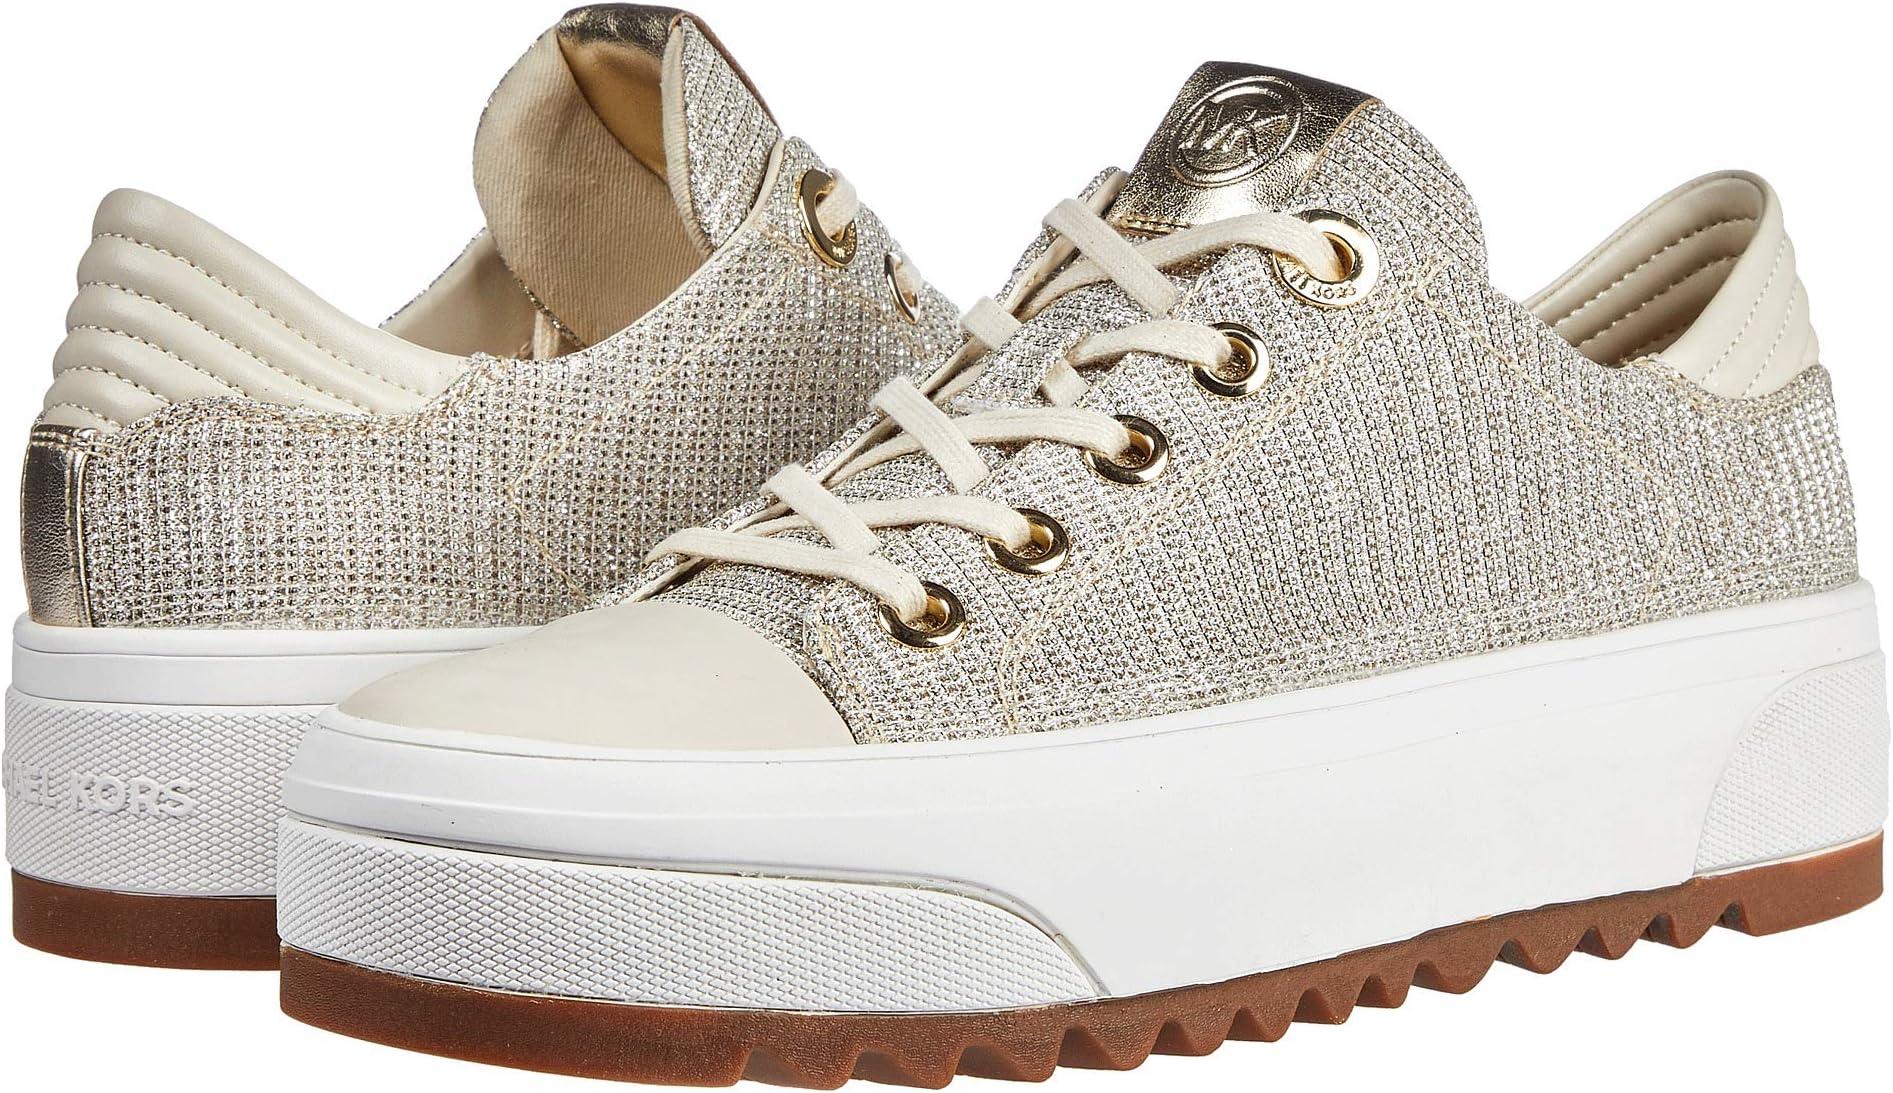 Michael Kors Shoes, Handbags, Clothing